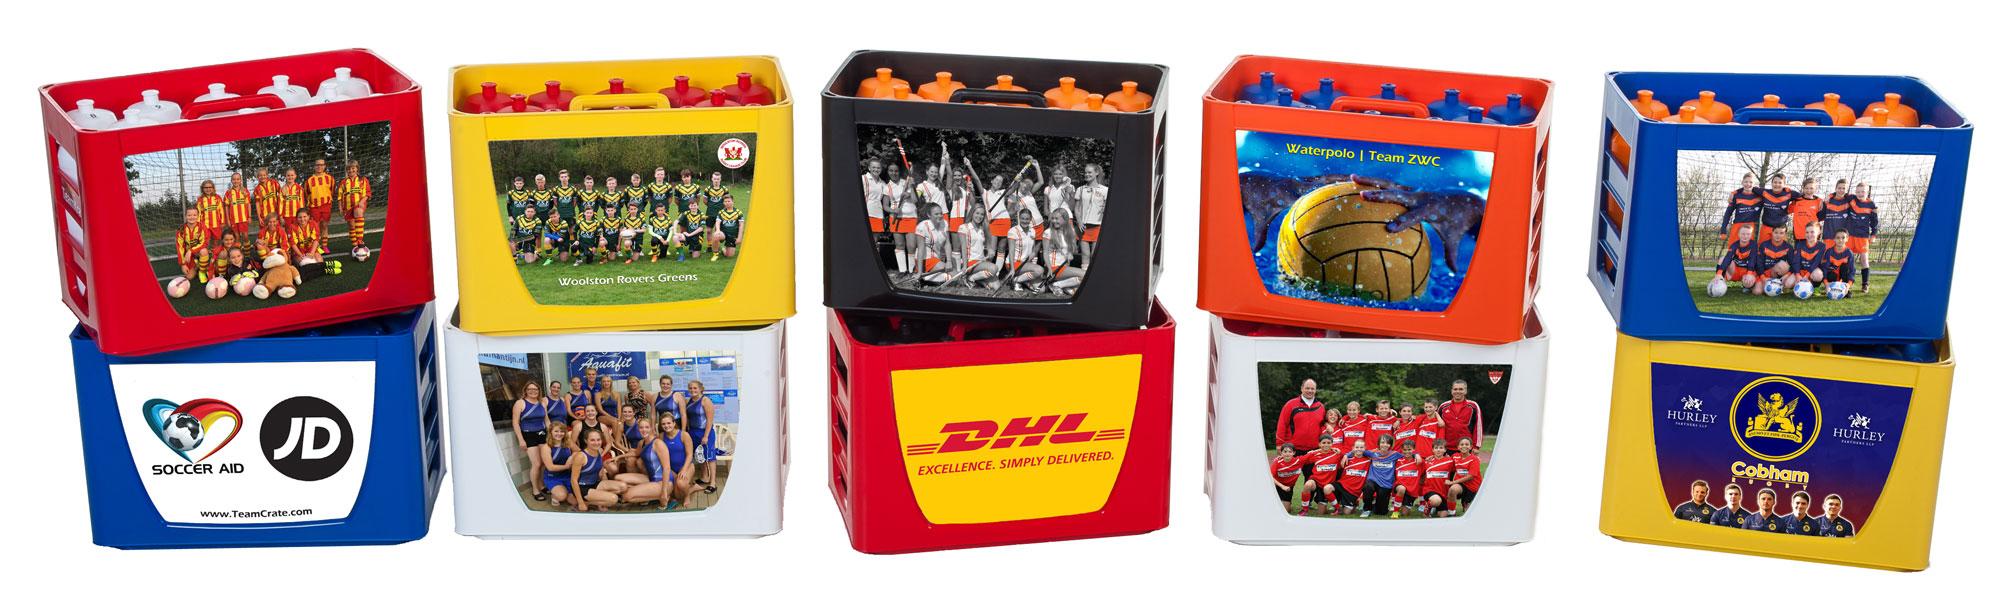 Sports bottle carrier set - EMPASO TeamCrate